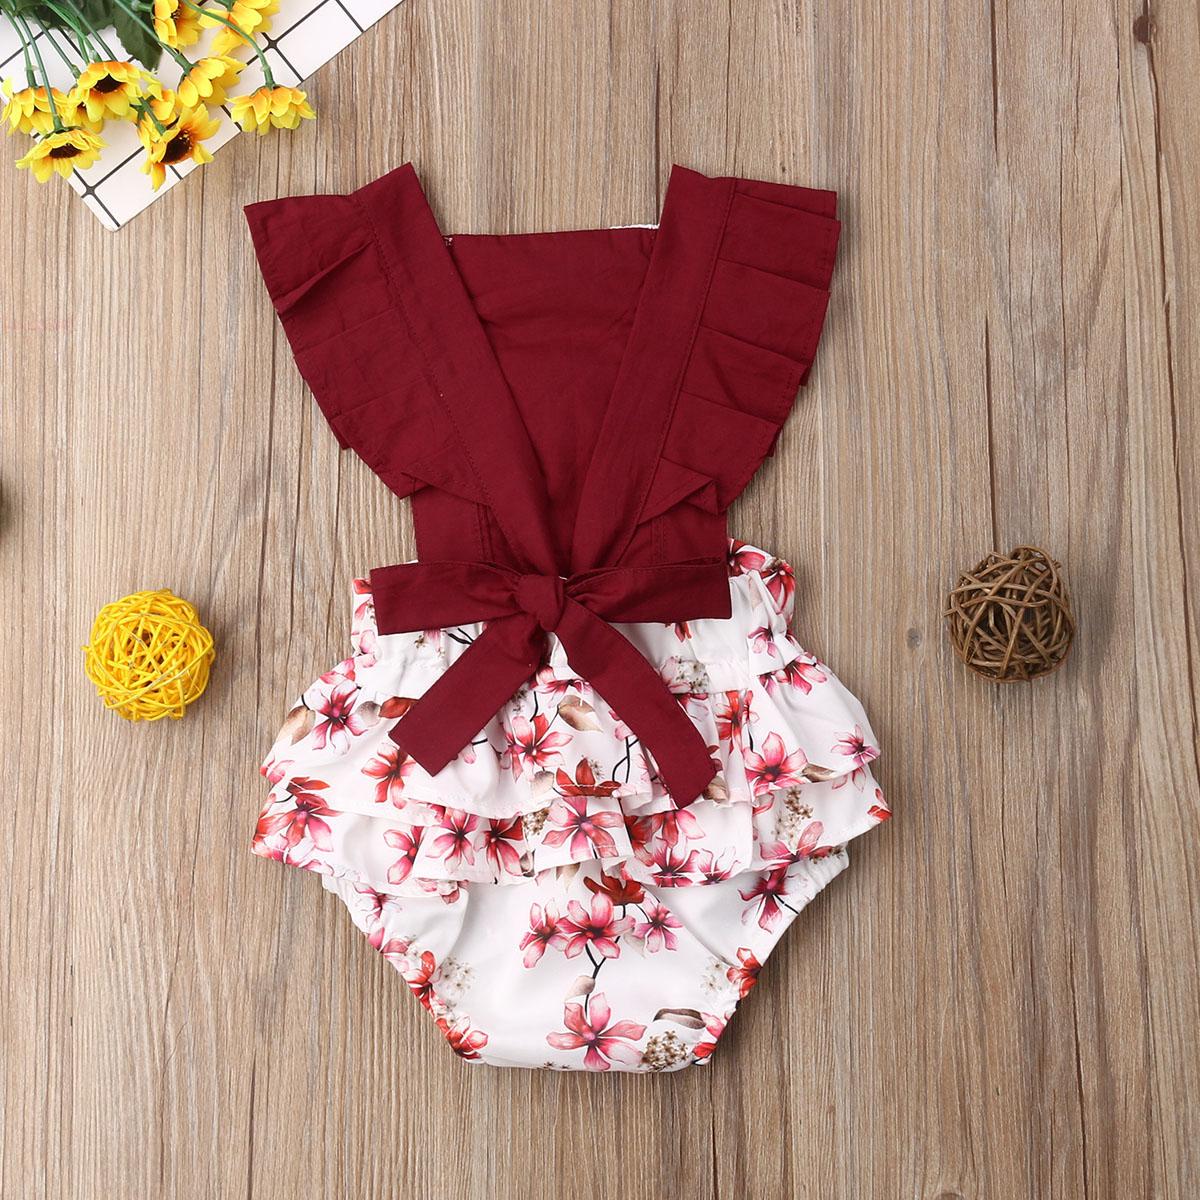 M Newborn Infant Baby Girl Flower Lace Clothes Flutter Sleeve Patchwork Bubble Jumpsuit Romper One